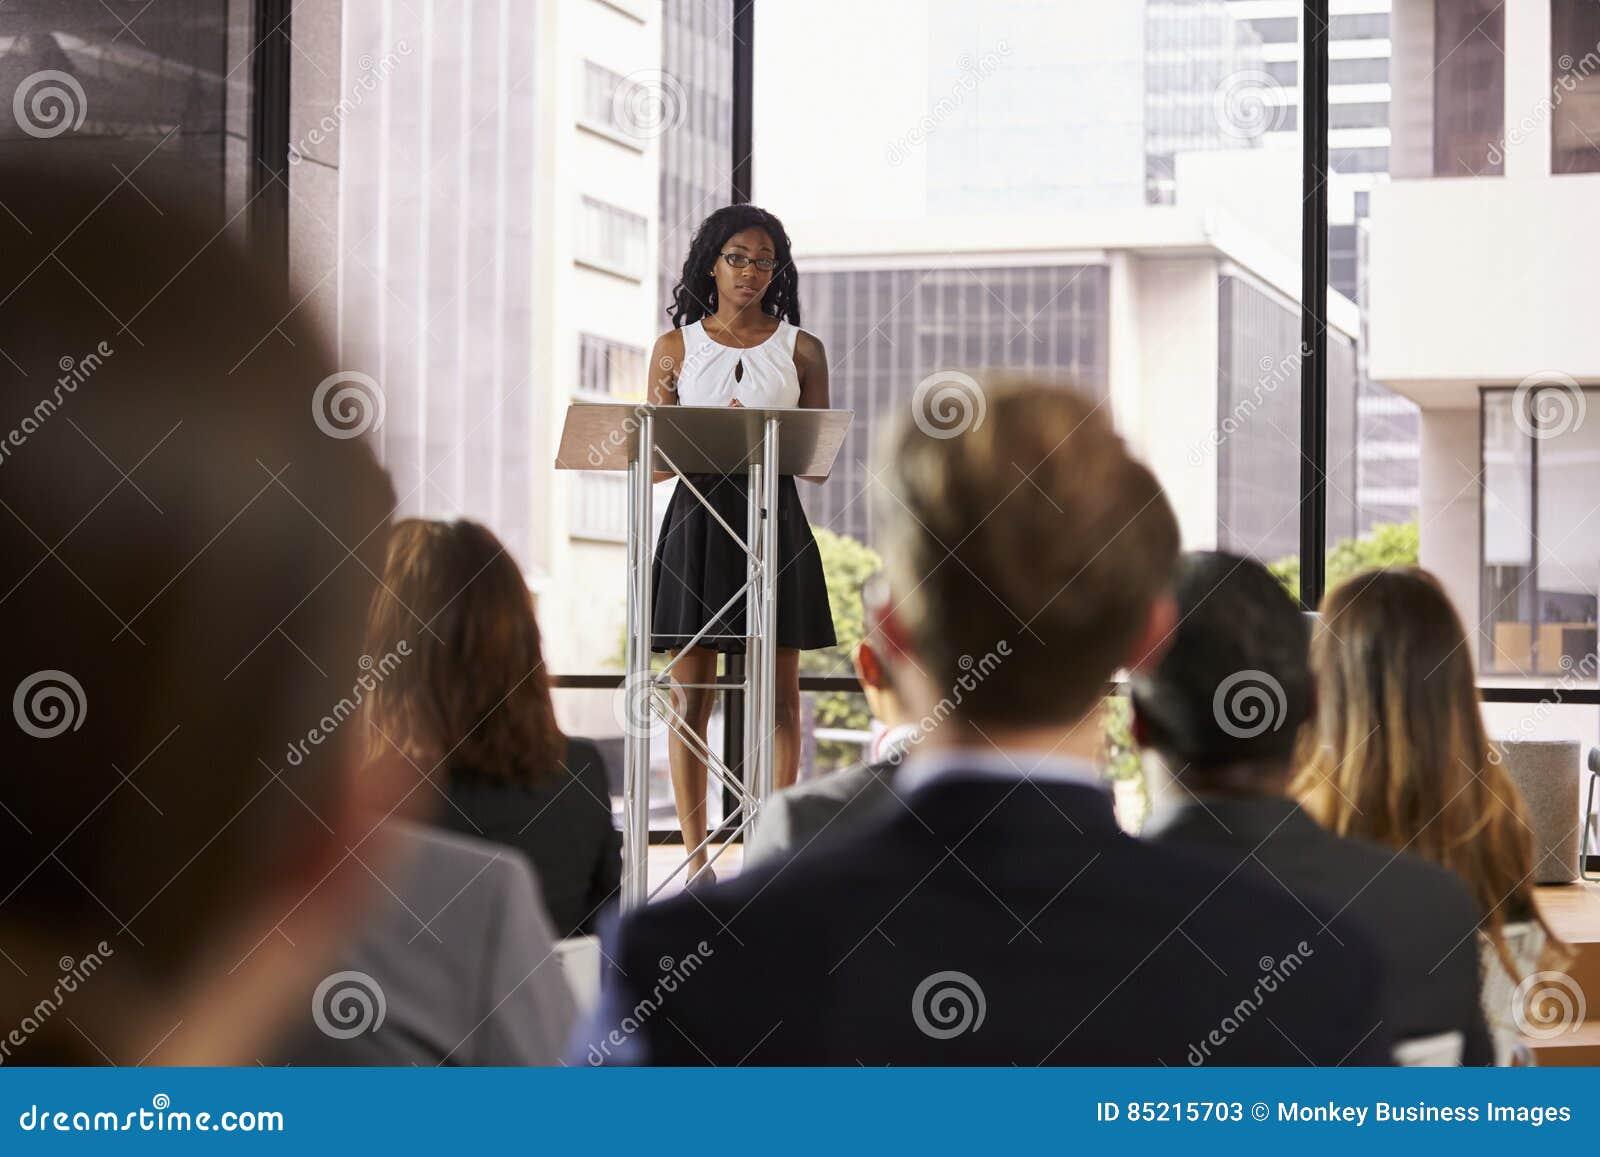 Young black woman at lectern presenting seminar to audience